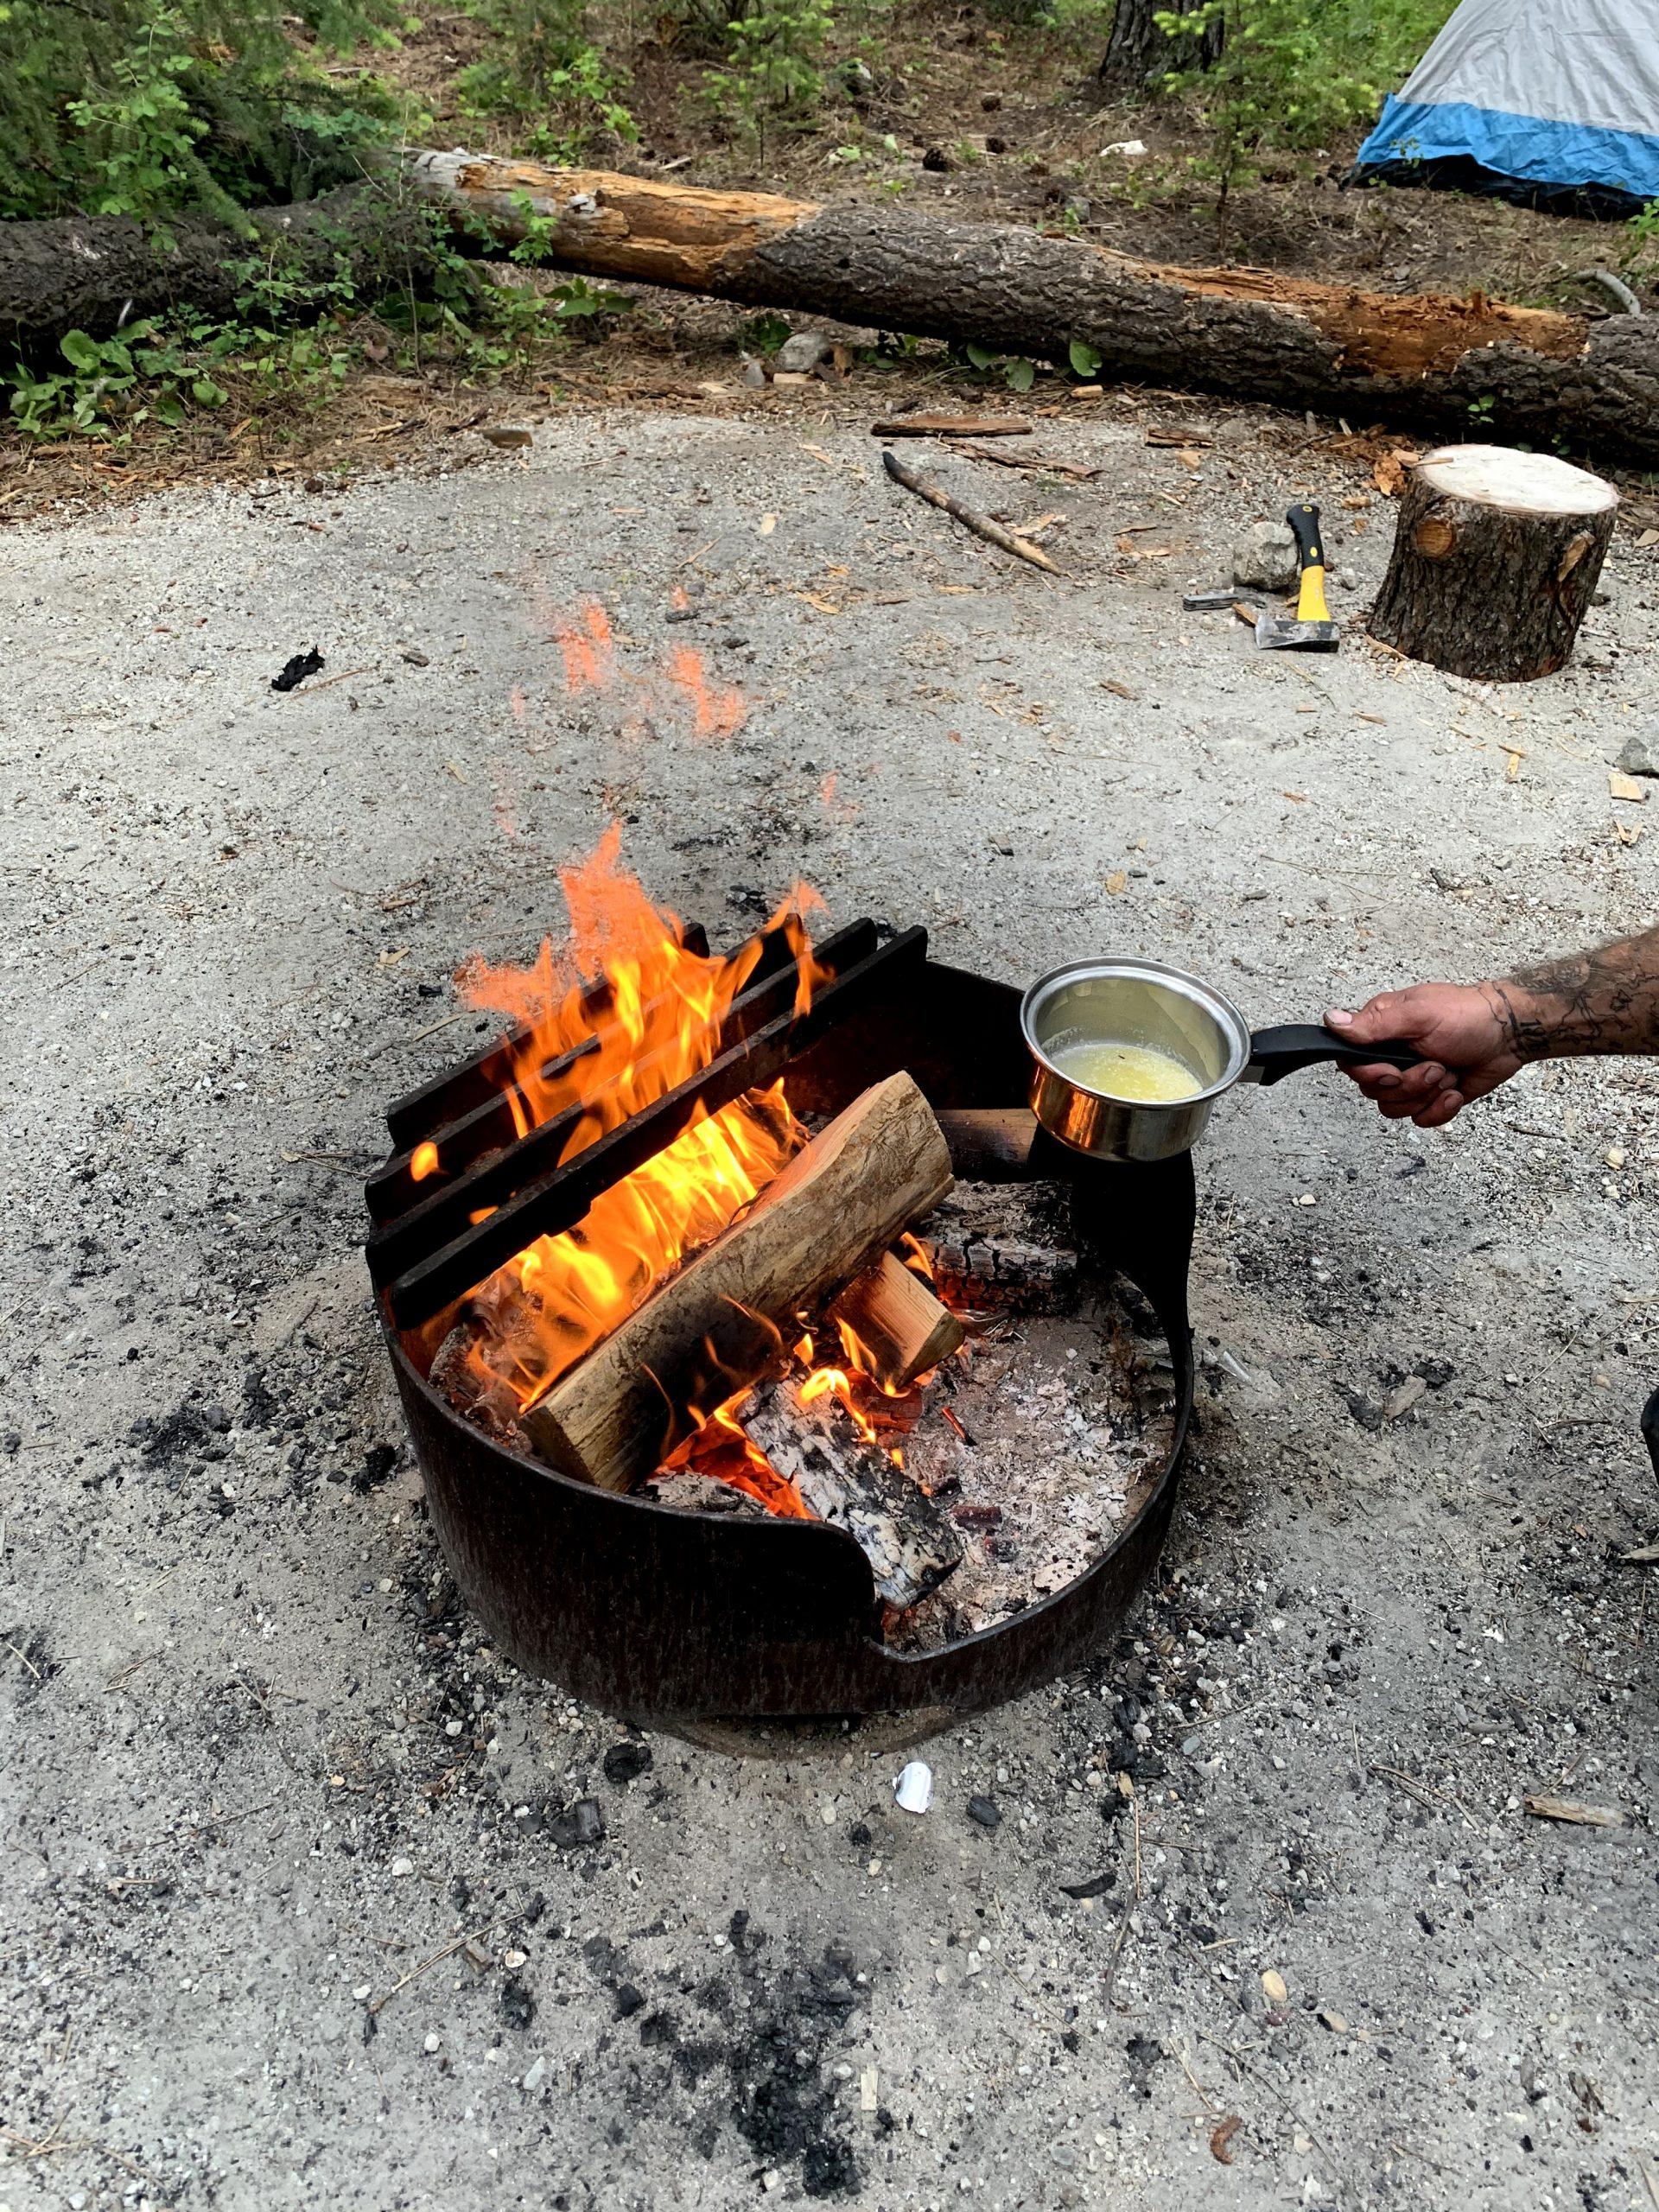 Melting butter on fire